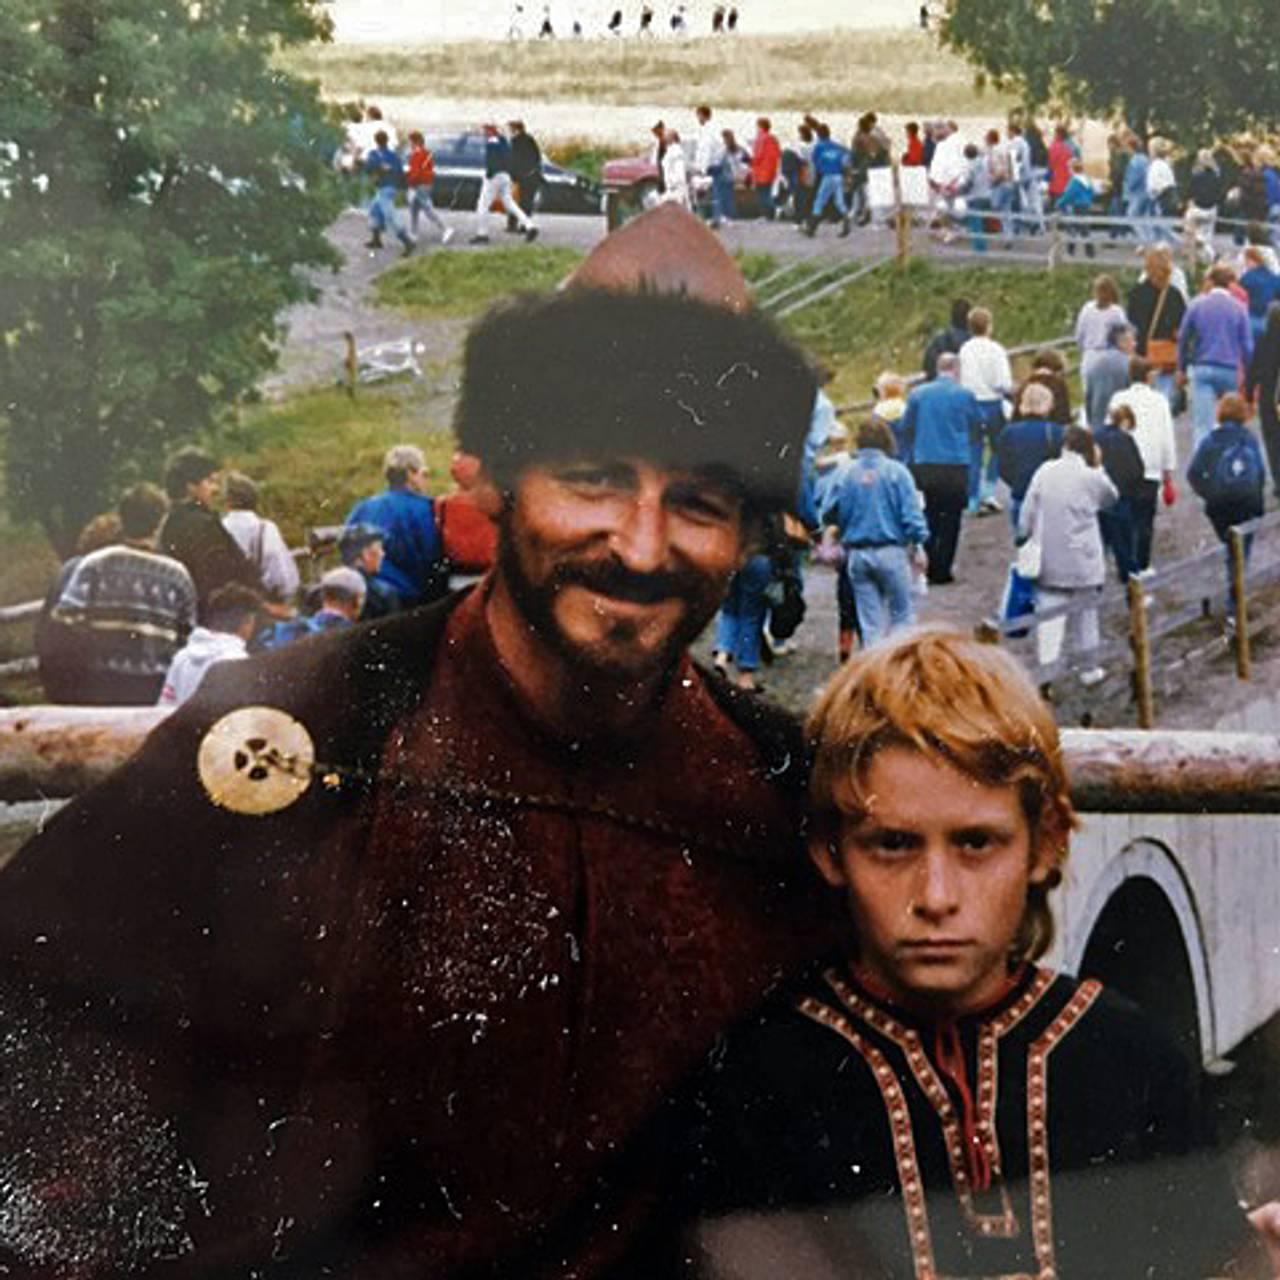 Kristofer Hivju er sju år og er med på spelet på Stiklestad.  Her står han sammen med far Erik Hivju.